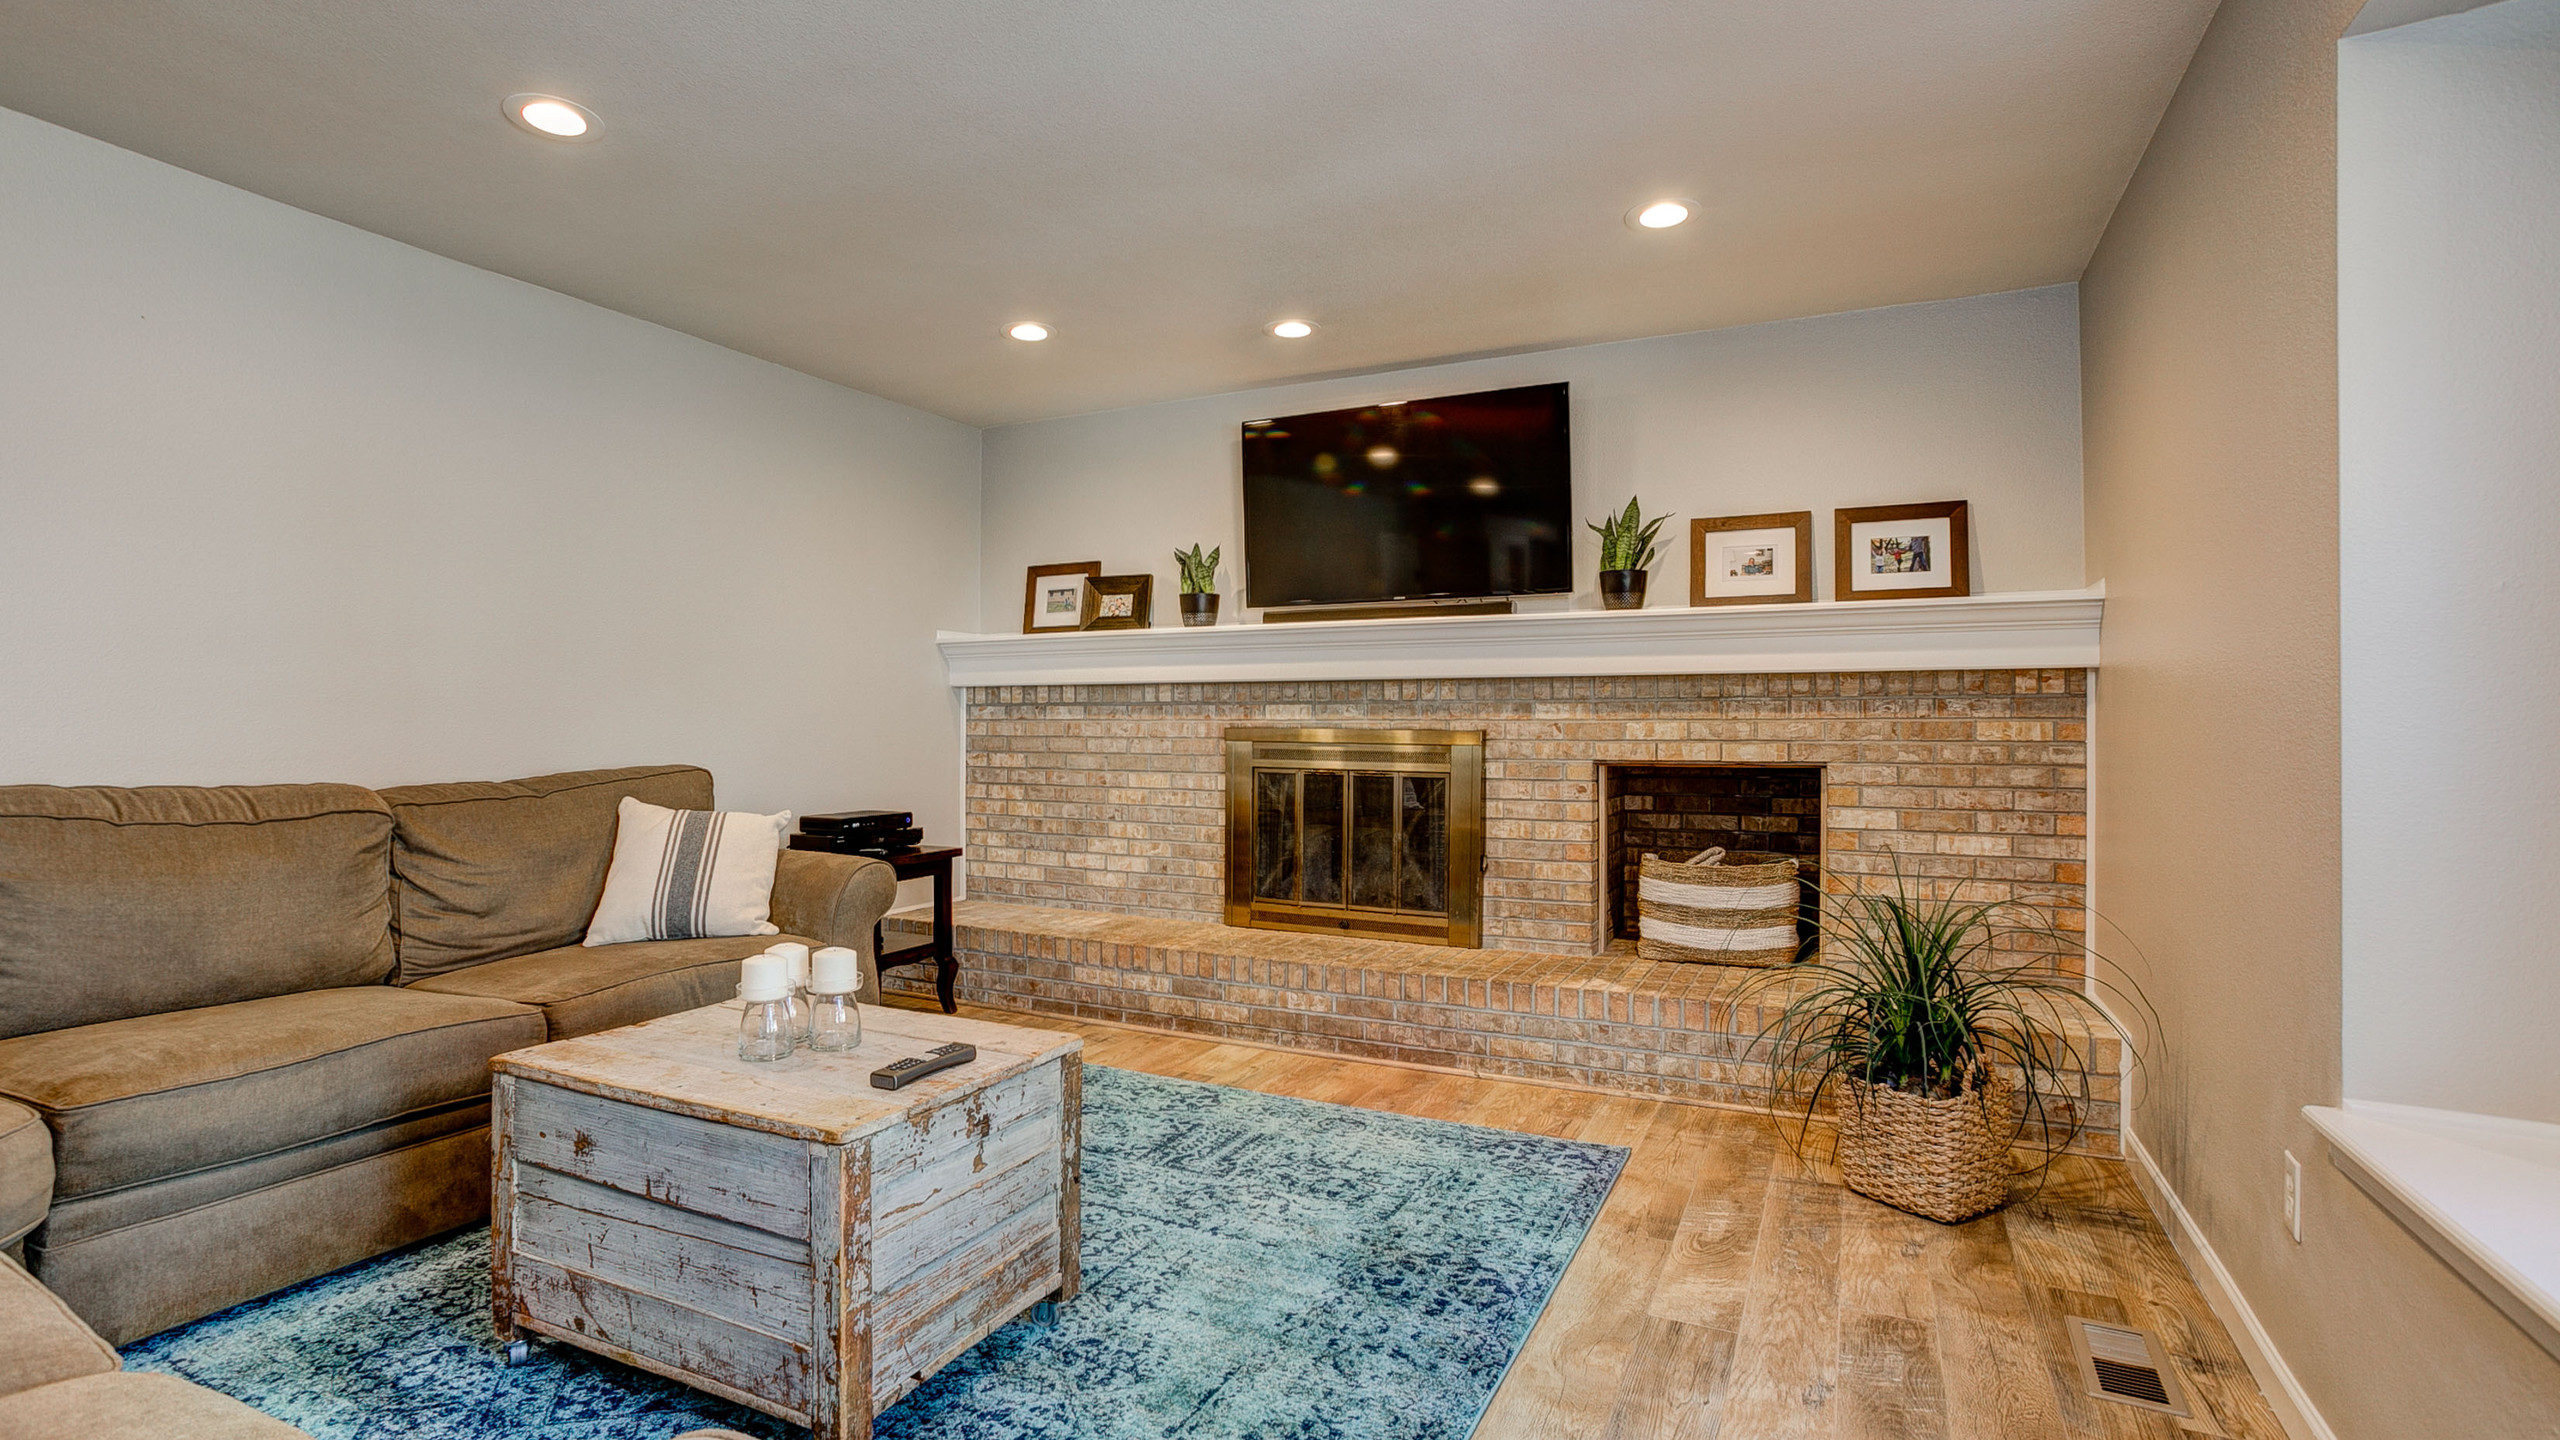 Brick Encased Fireplace w/ Hearth